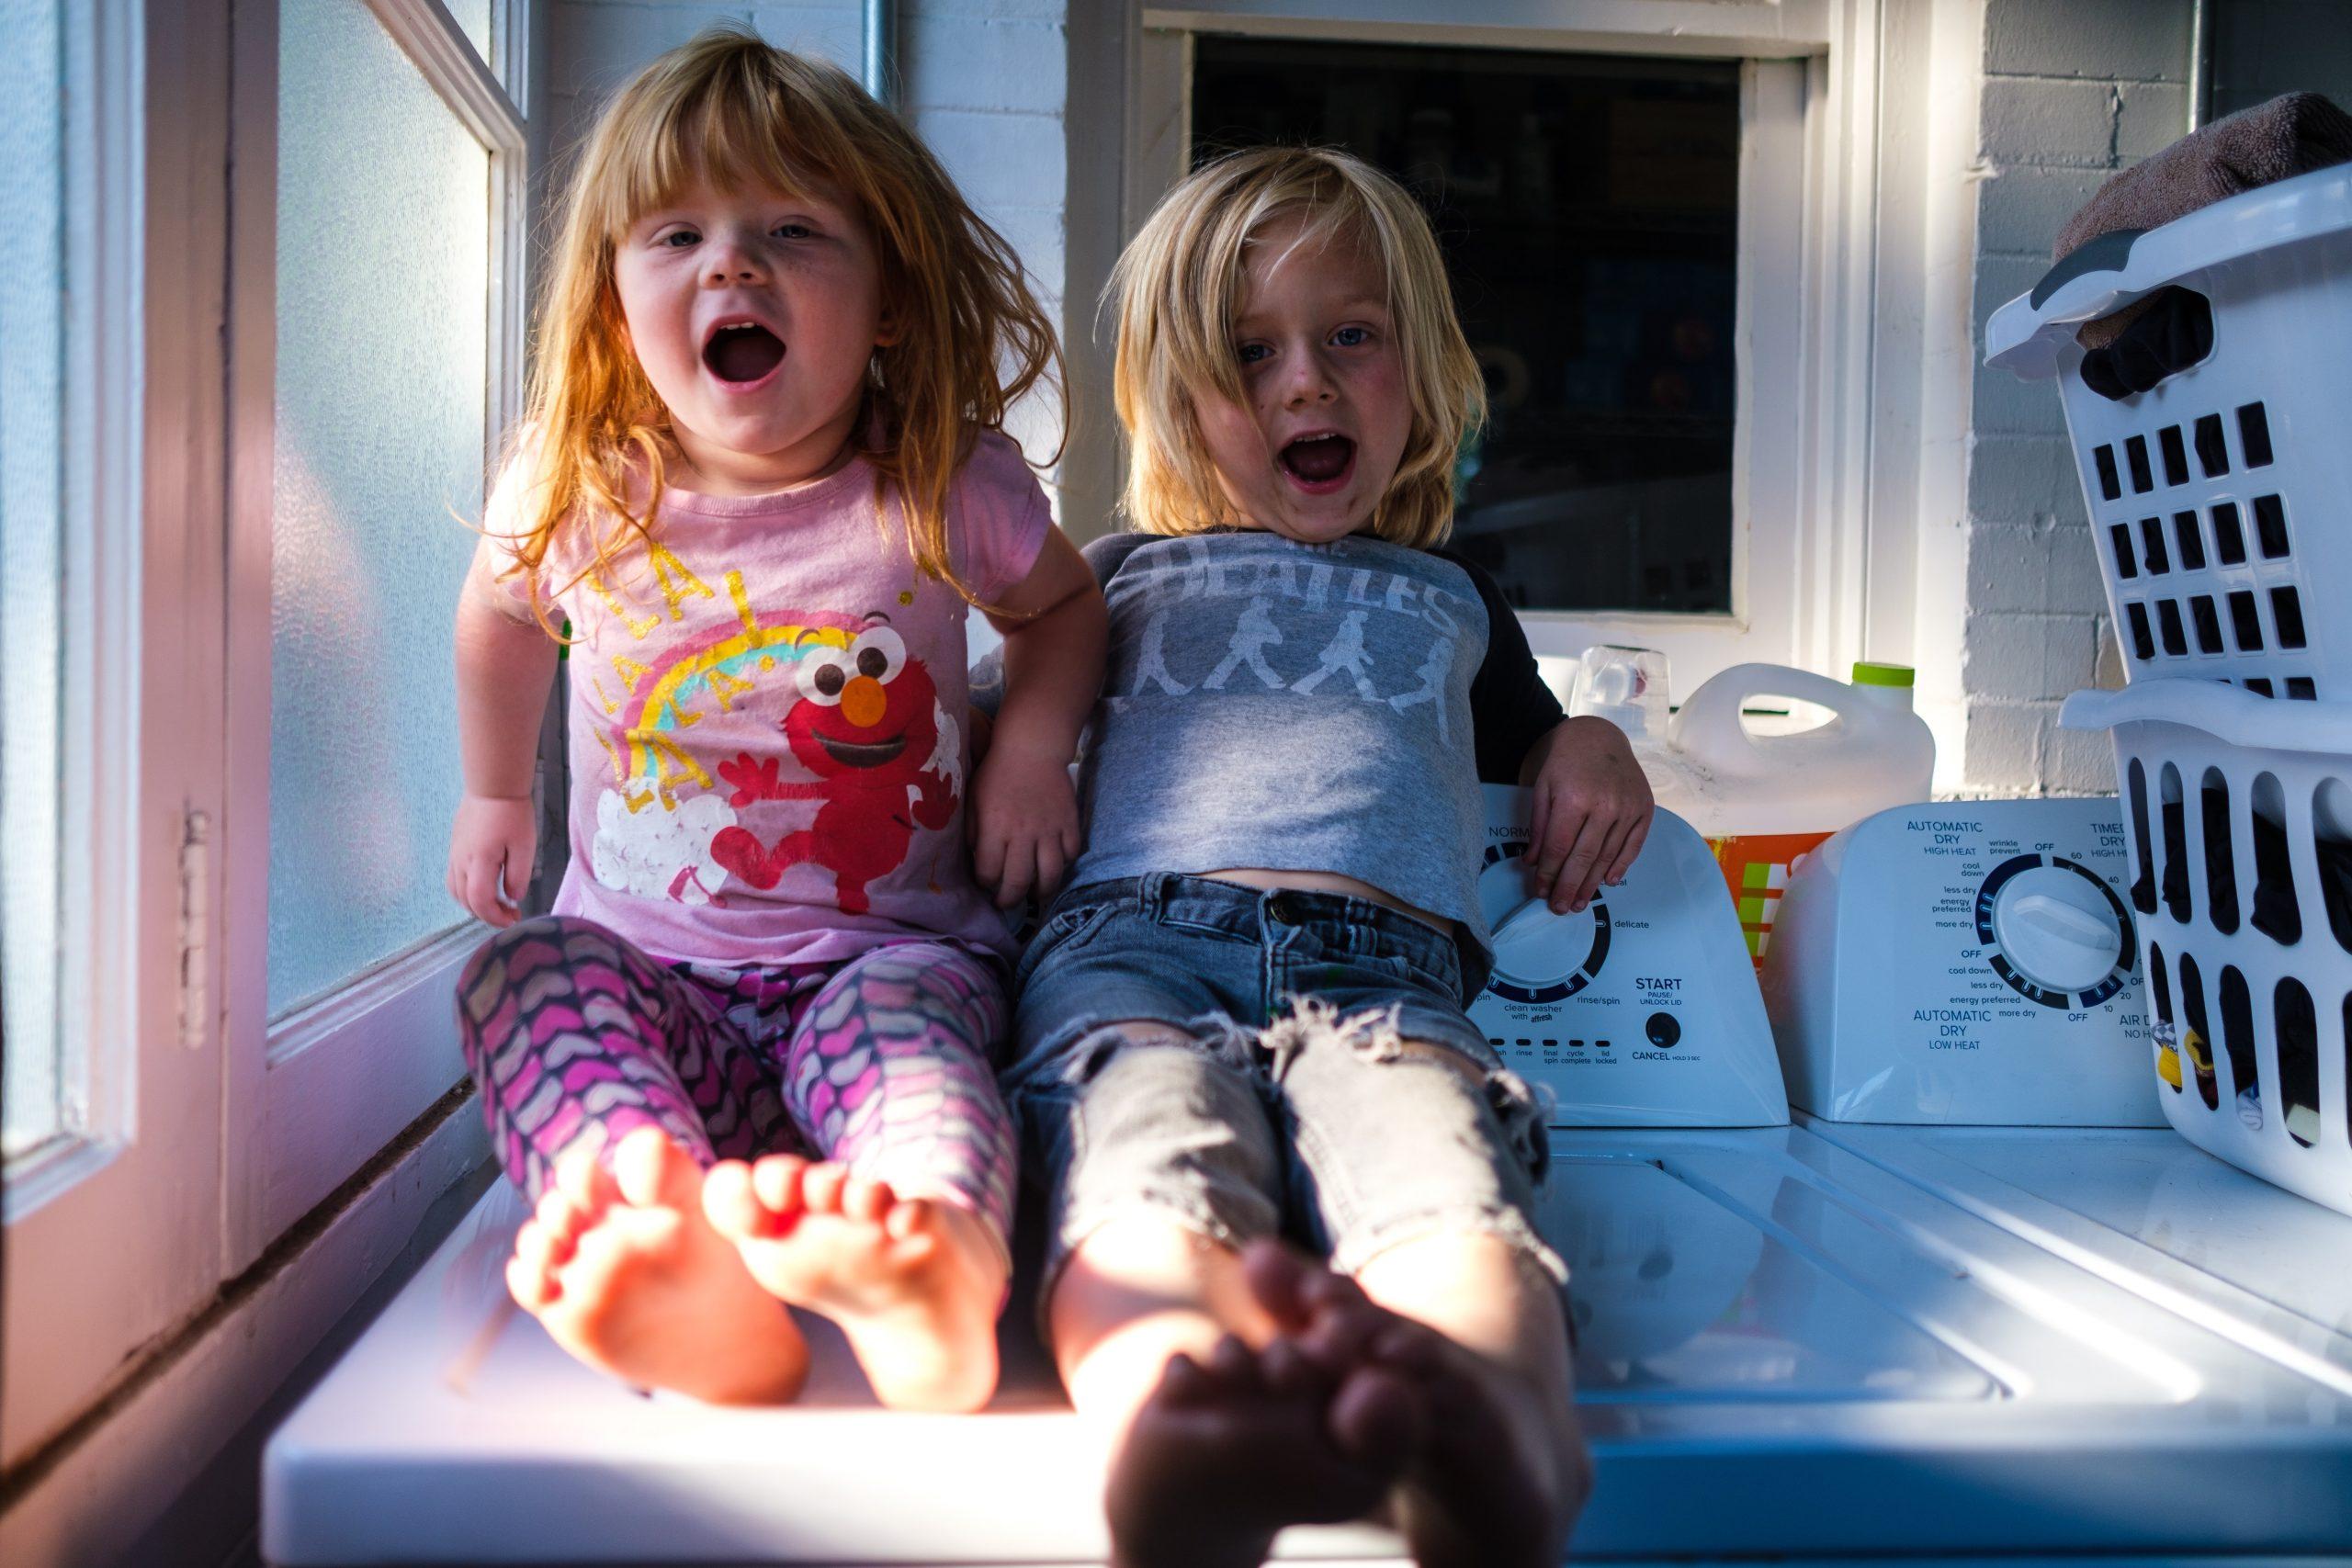 Dos niñas sentadas sobre una lavadora